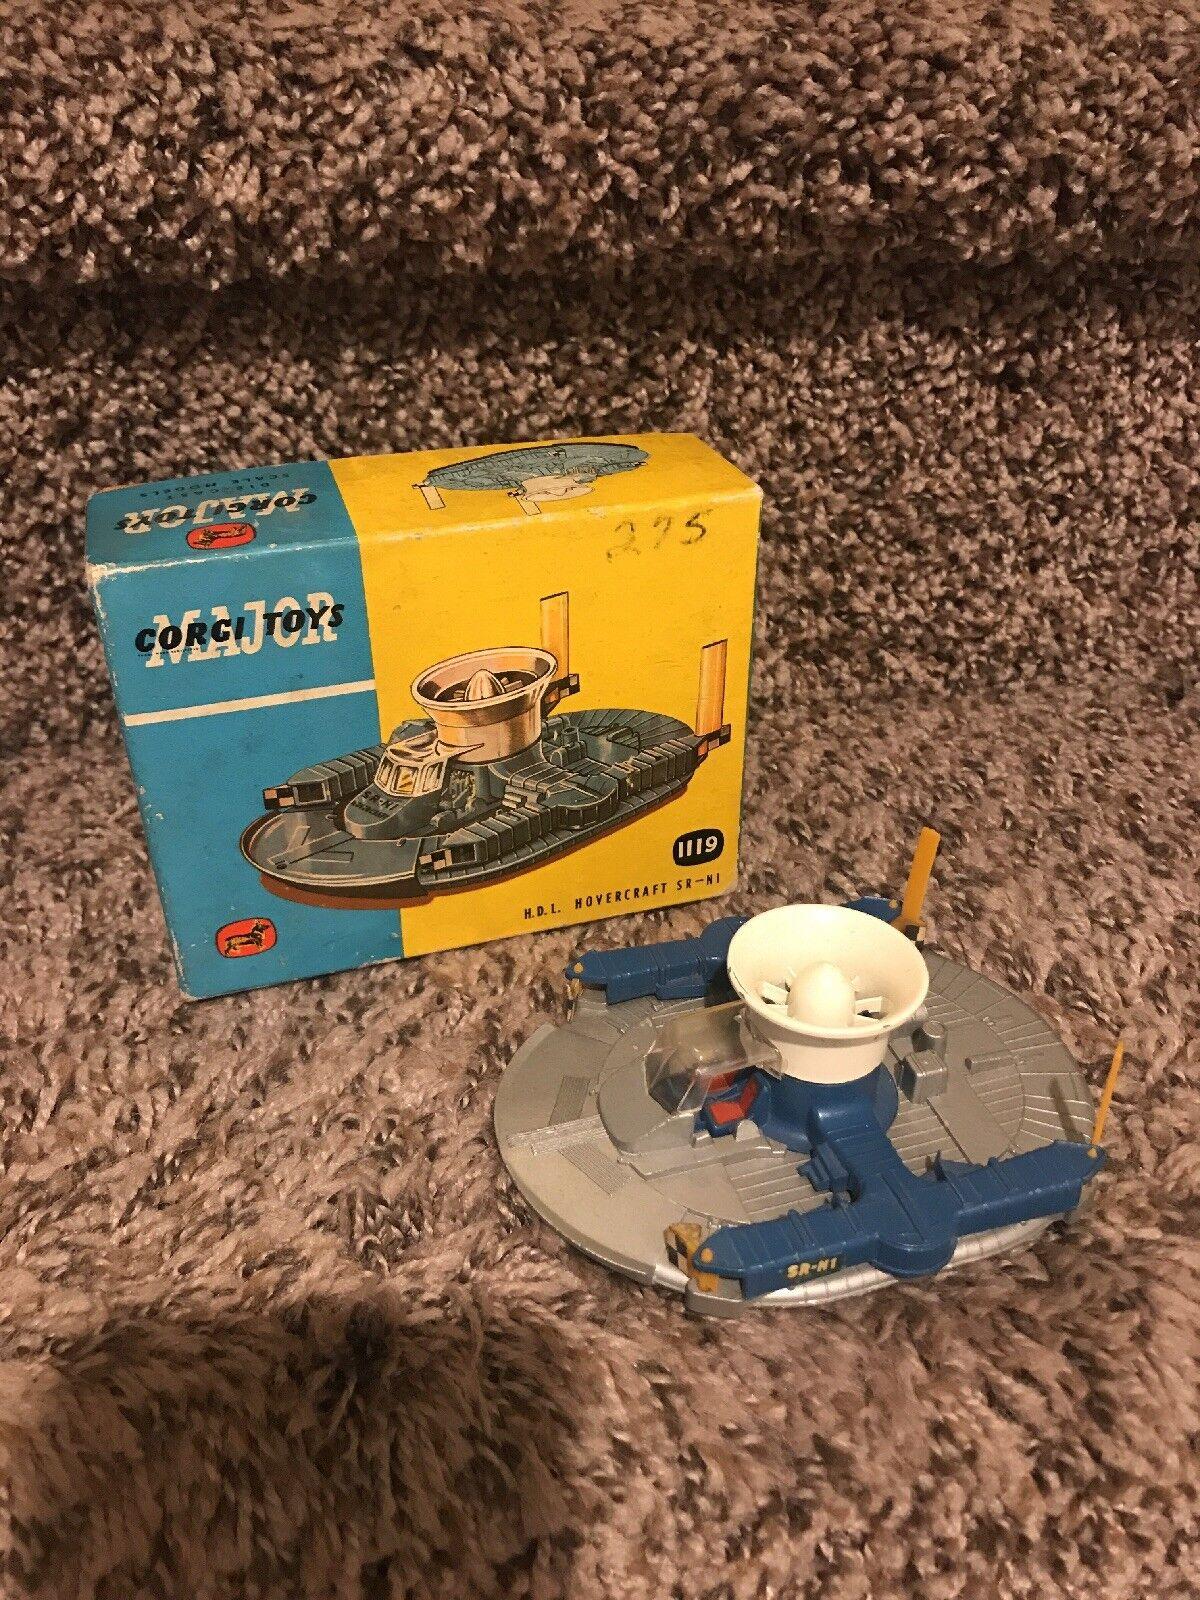 Corgi Toys H.d.l Hovercraft Sr-n1 Vintage Toy